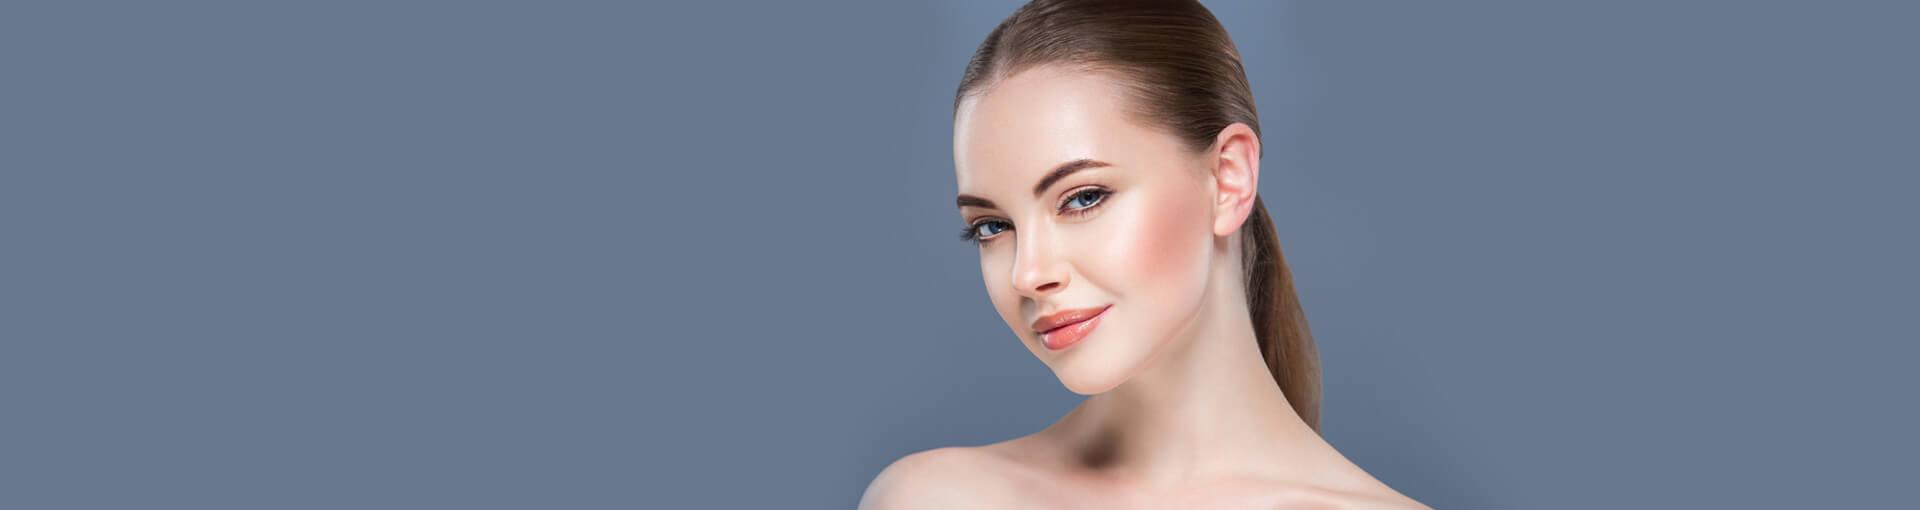 Chemical Peels - drs skin care